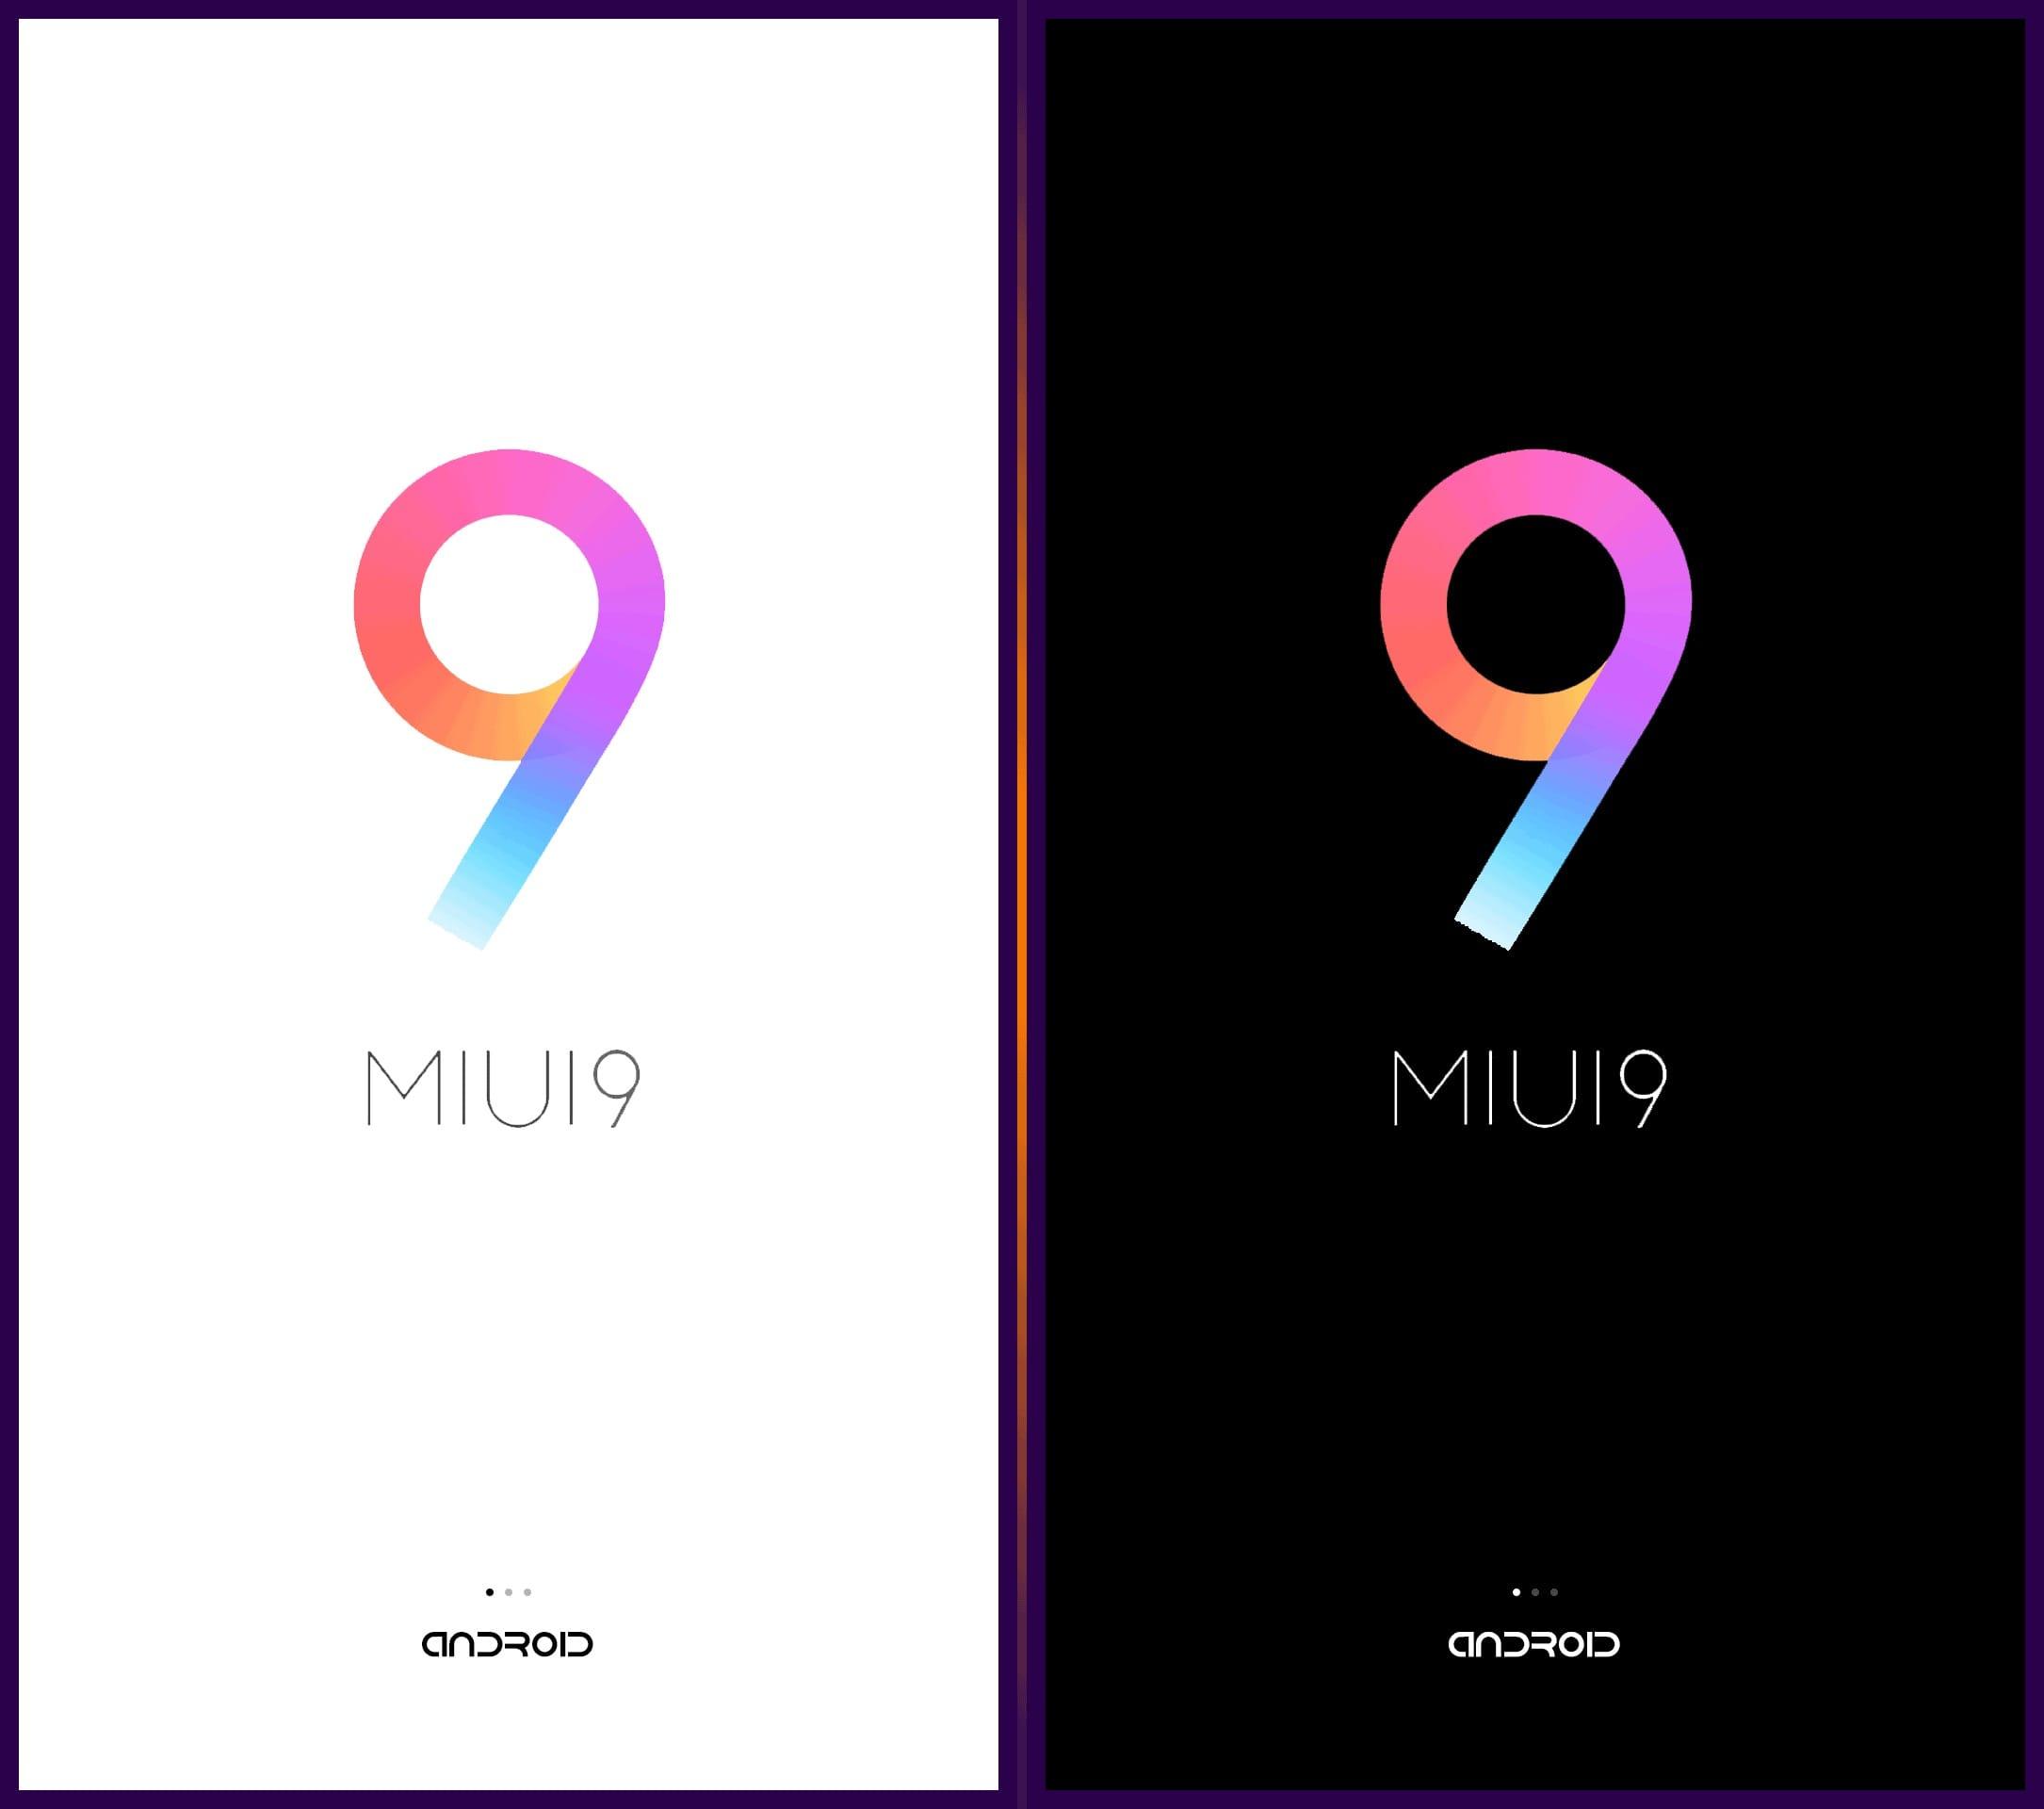 Все смартфоны Xiaomi обновят до Android 8 0 Oreo в виде MIUI 9 – сроки